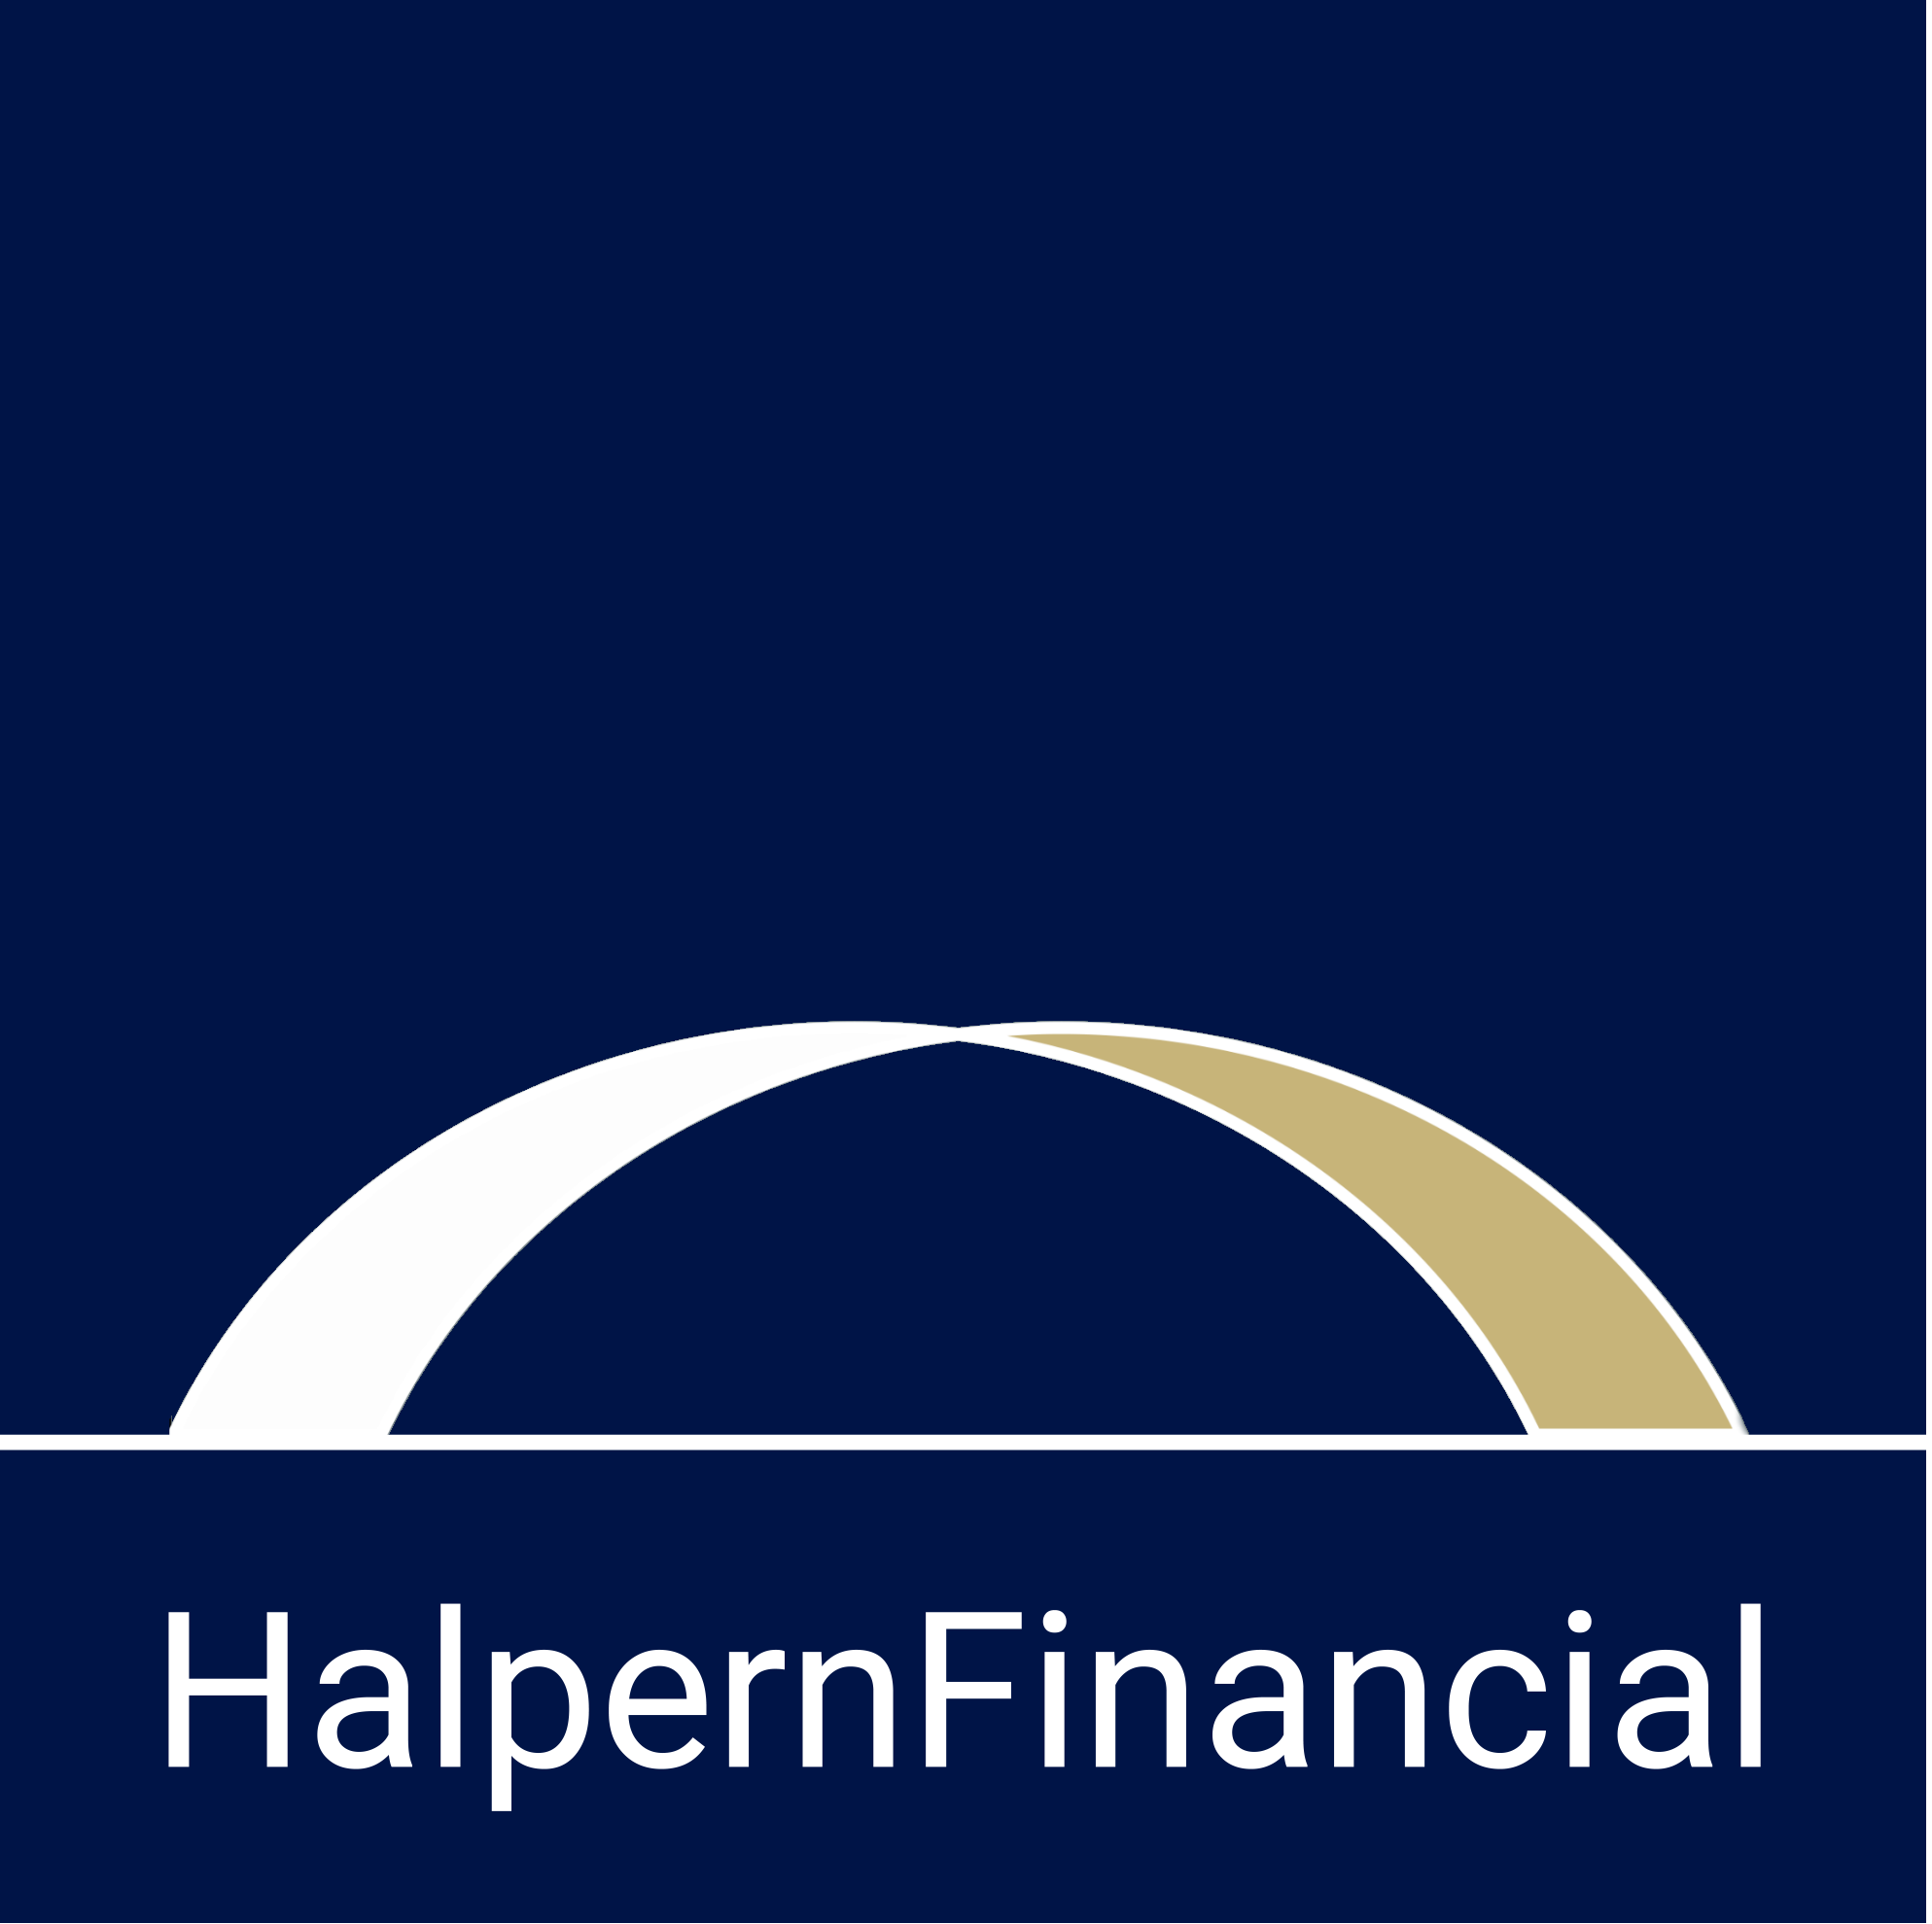 Halpern Financial: The Best of 2015 Thumbnail